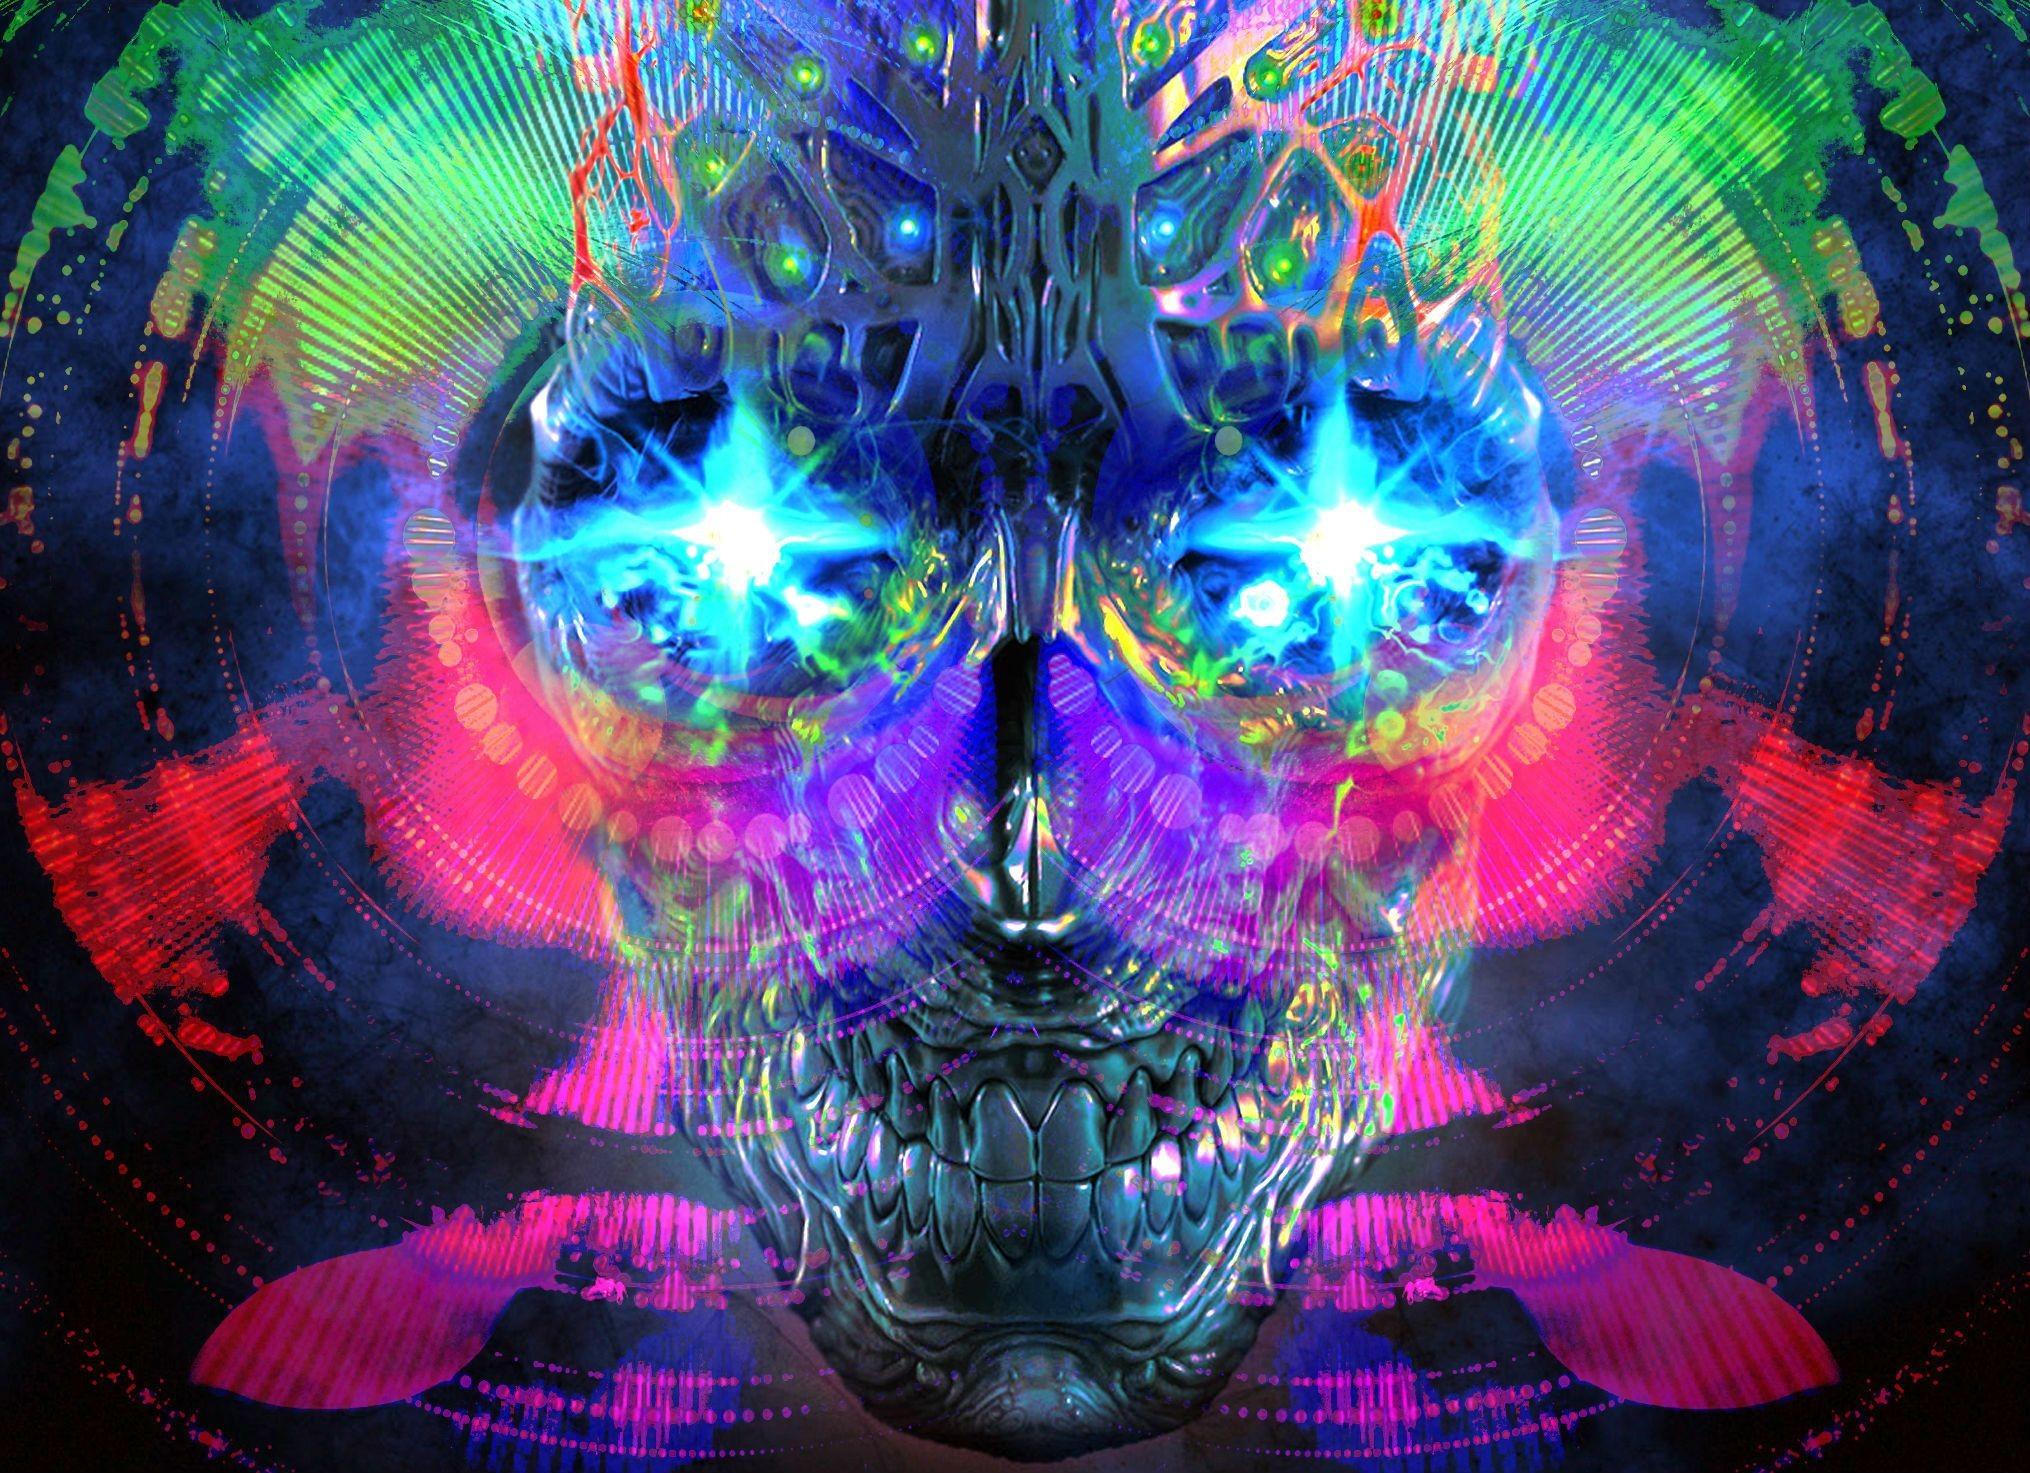 Psychedelic Computer Wallpapers, Desktop Backgrounds